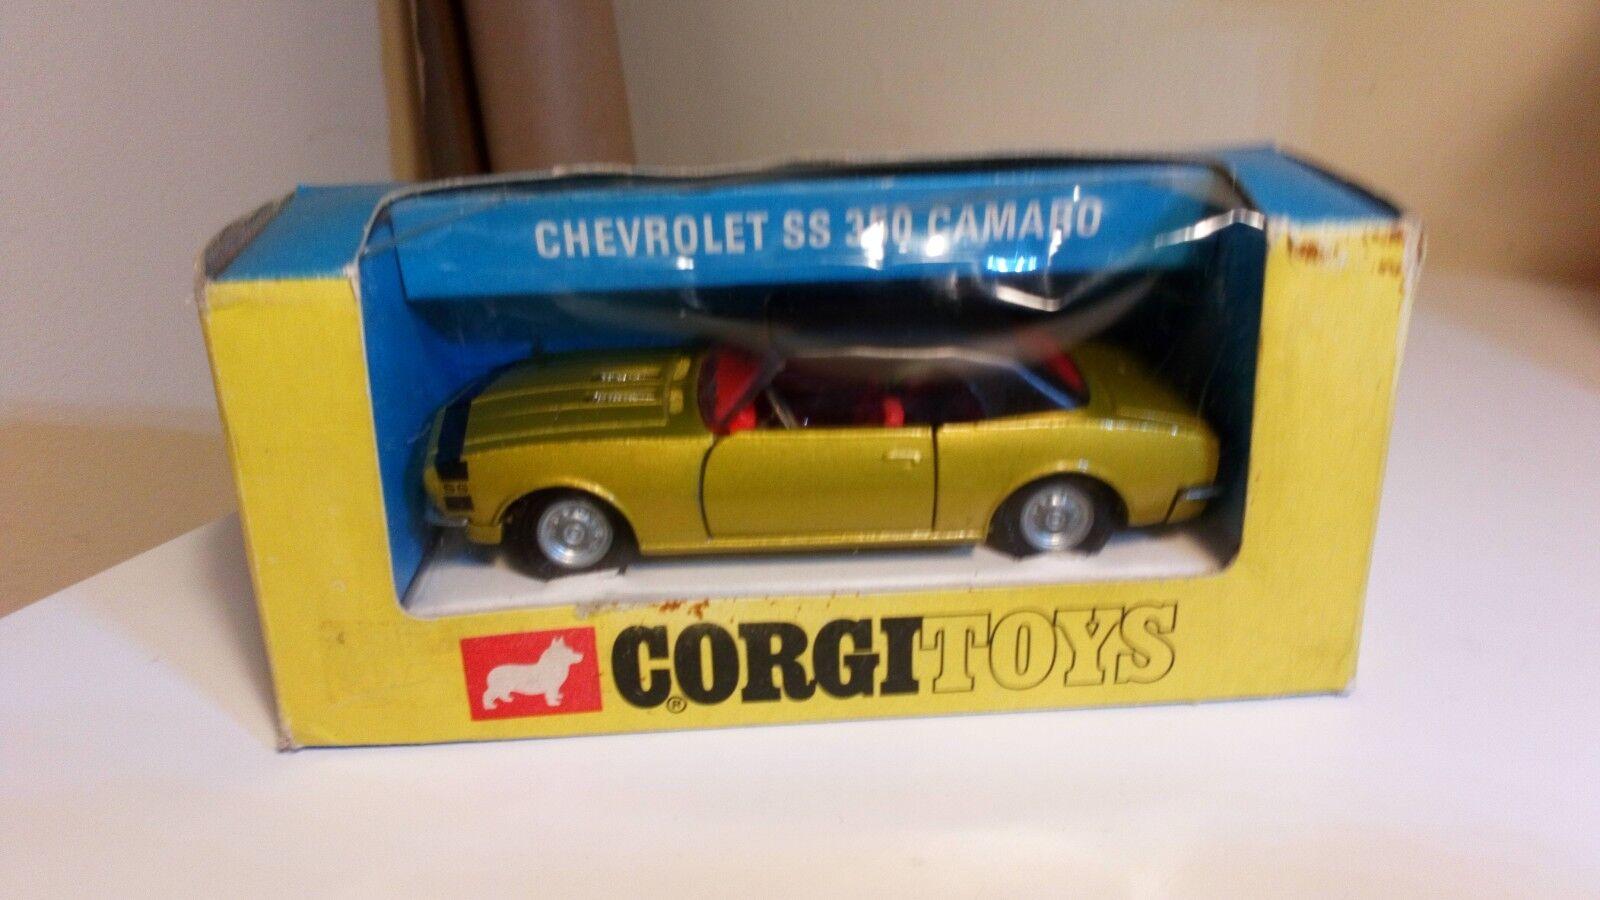 Chevrolet camaro ss 350 corgi.